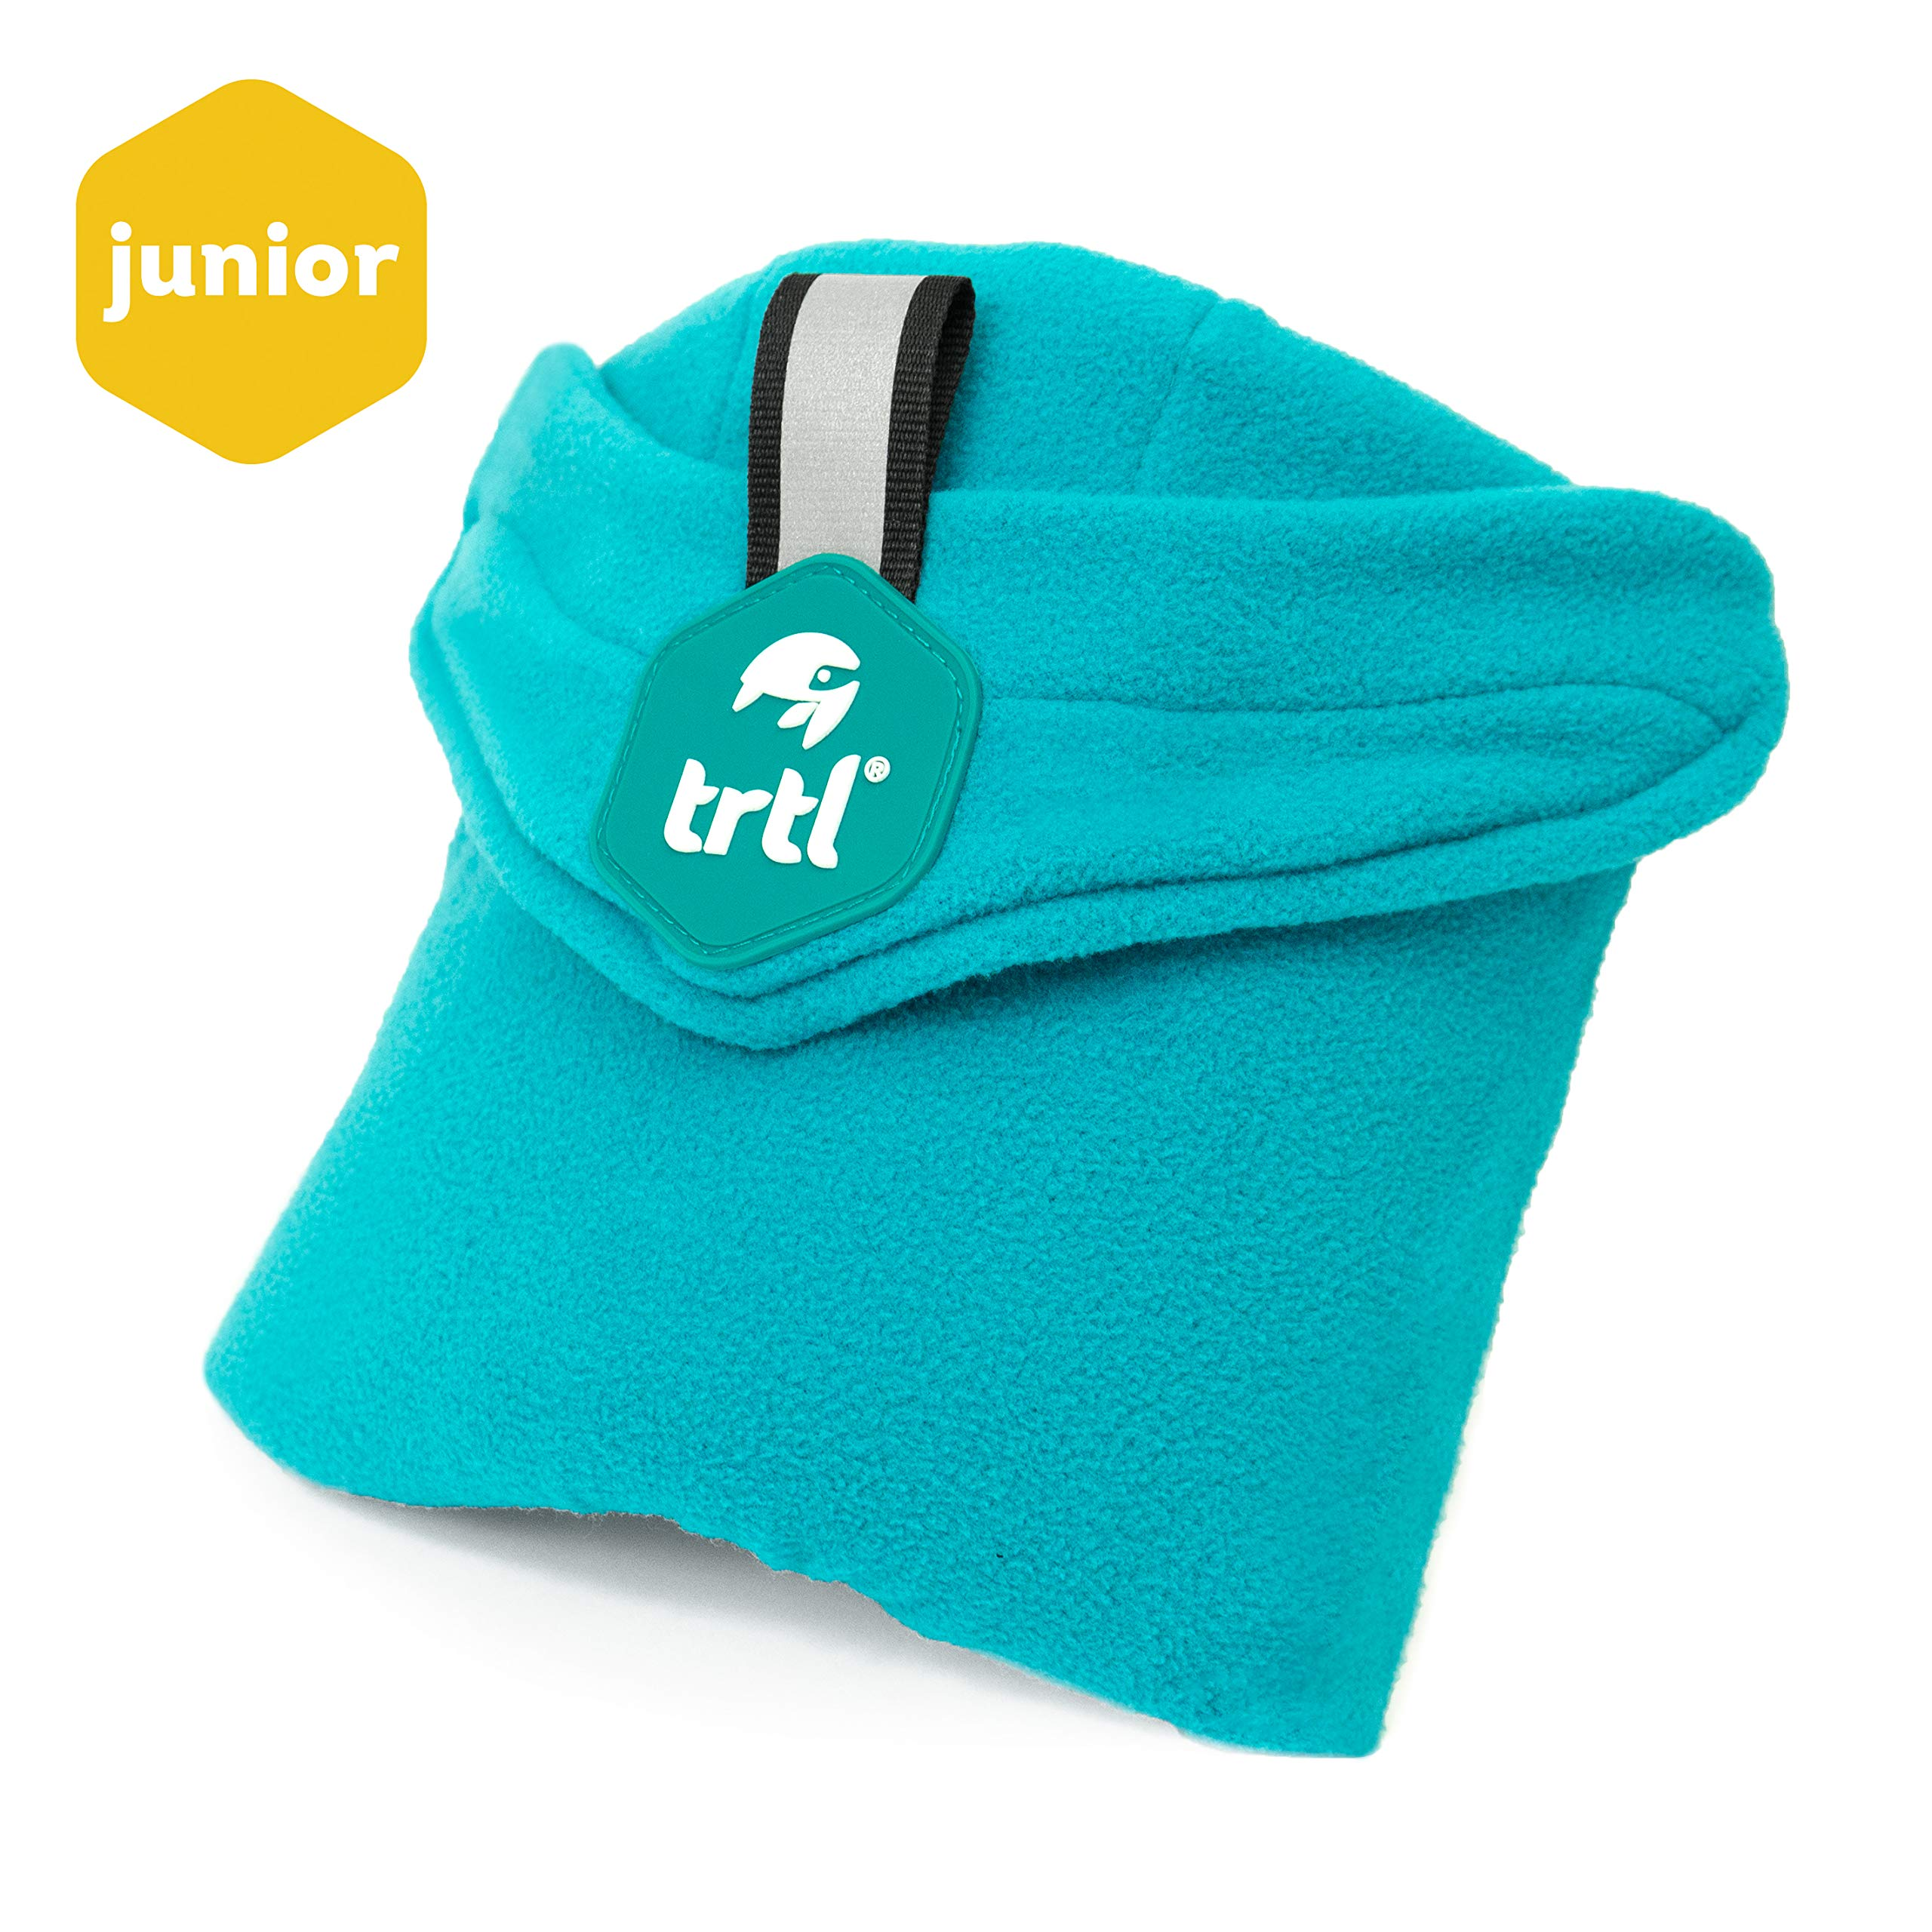 trtl Pillow Junior, Kids Travel Pillow with Built in Neck Support, Ergonomic Design and Hypoallergenic Fleece Travel Accessories for Kids Aged 8+ (Aqua Pop)